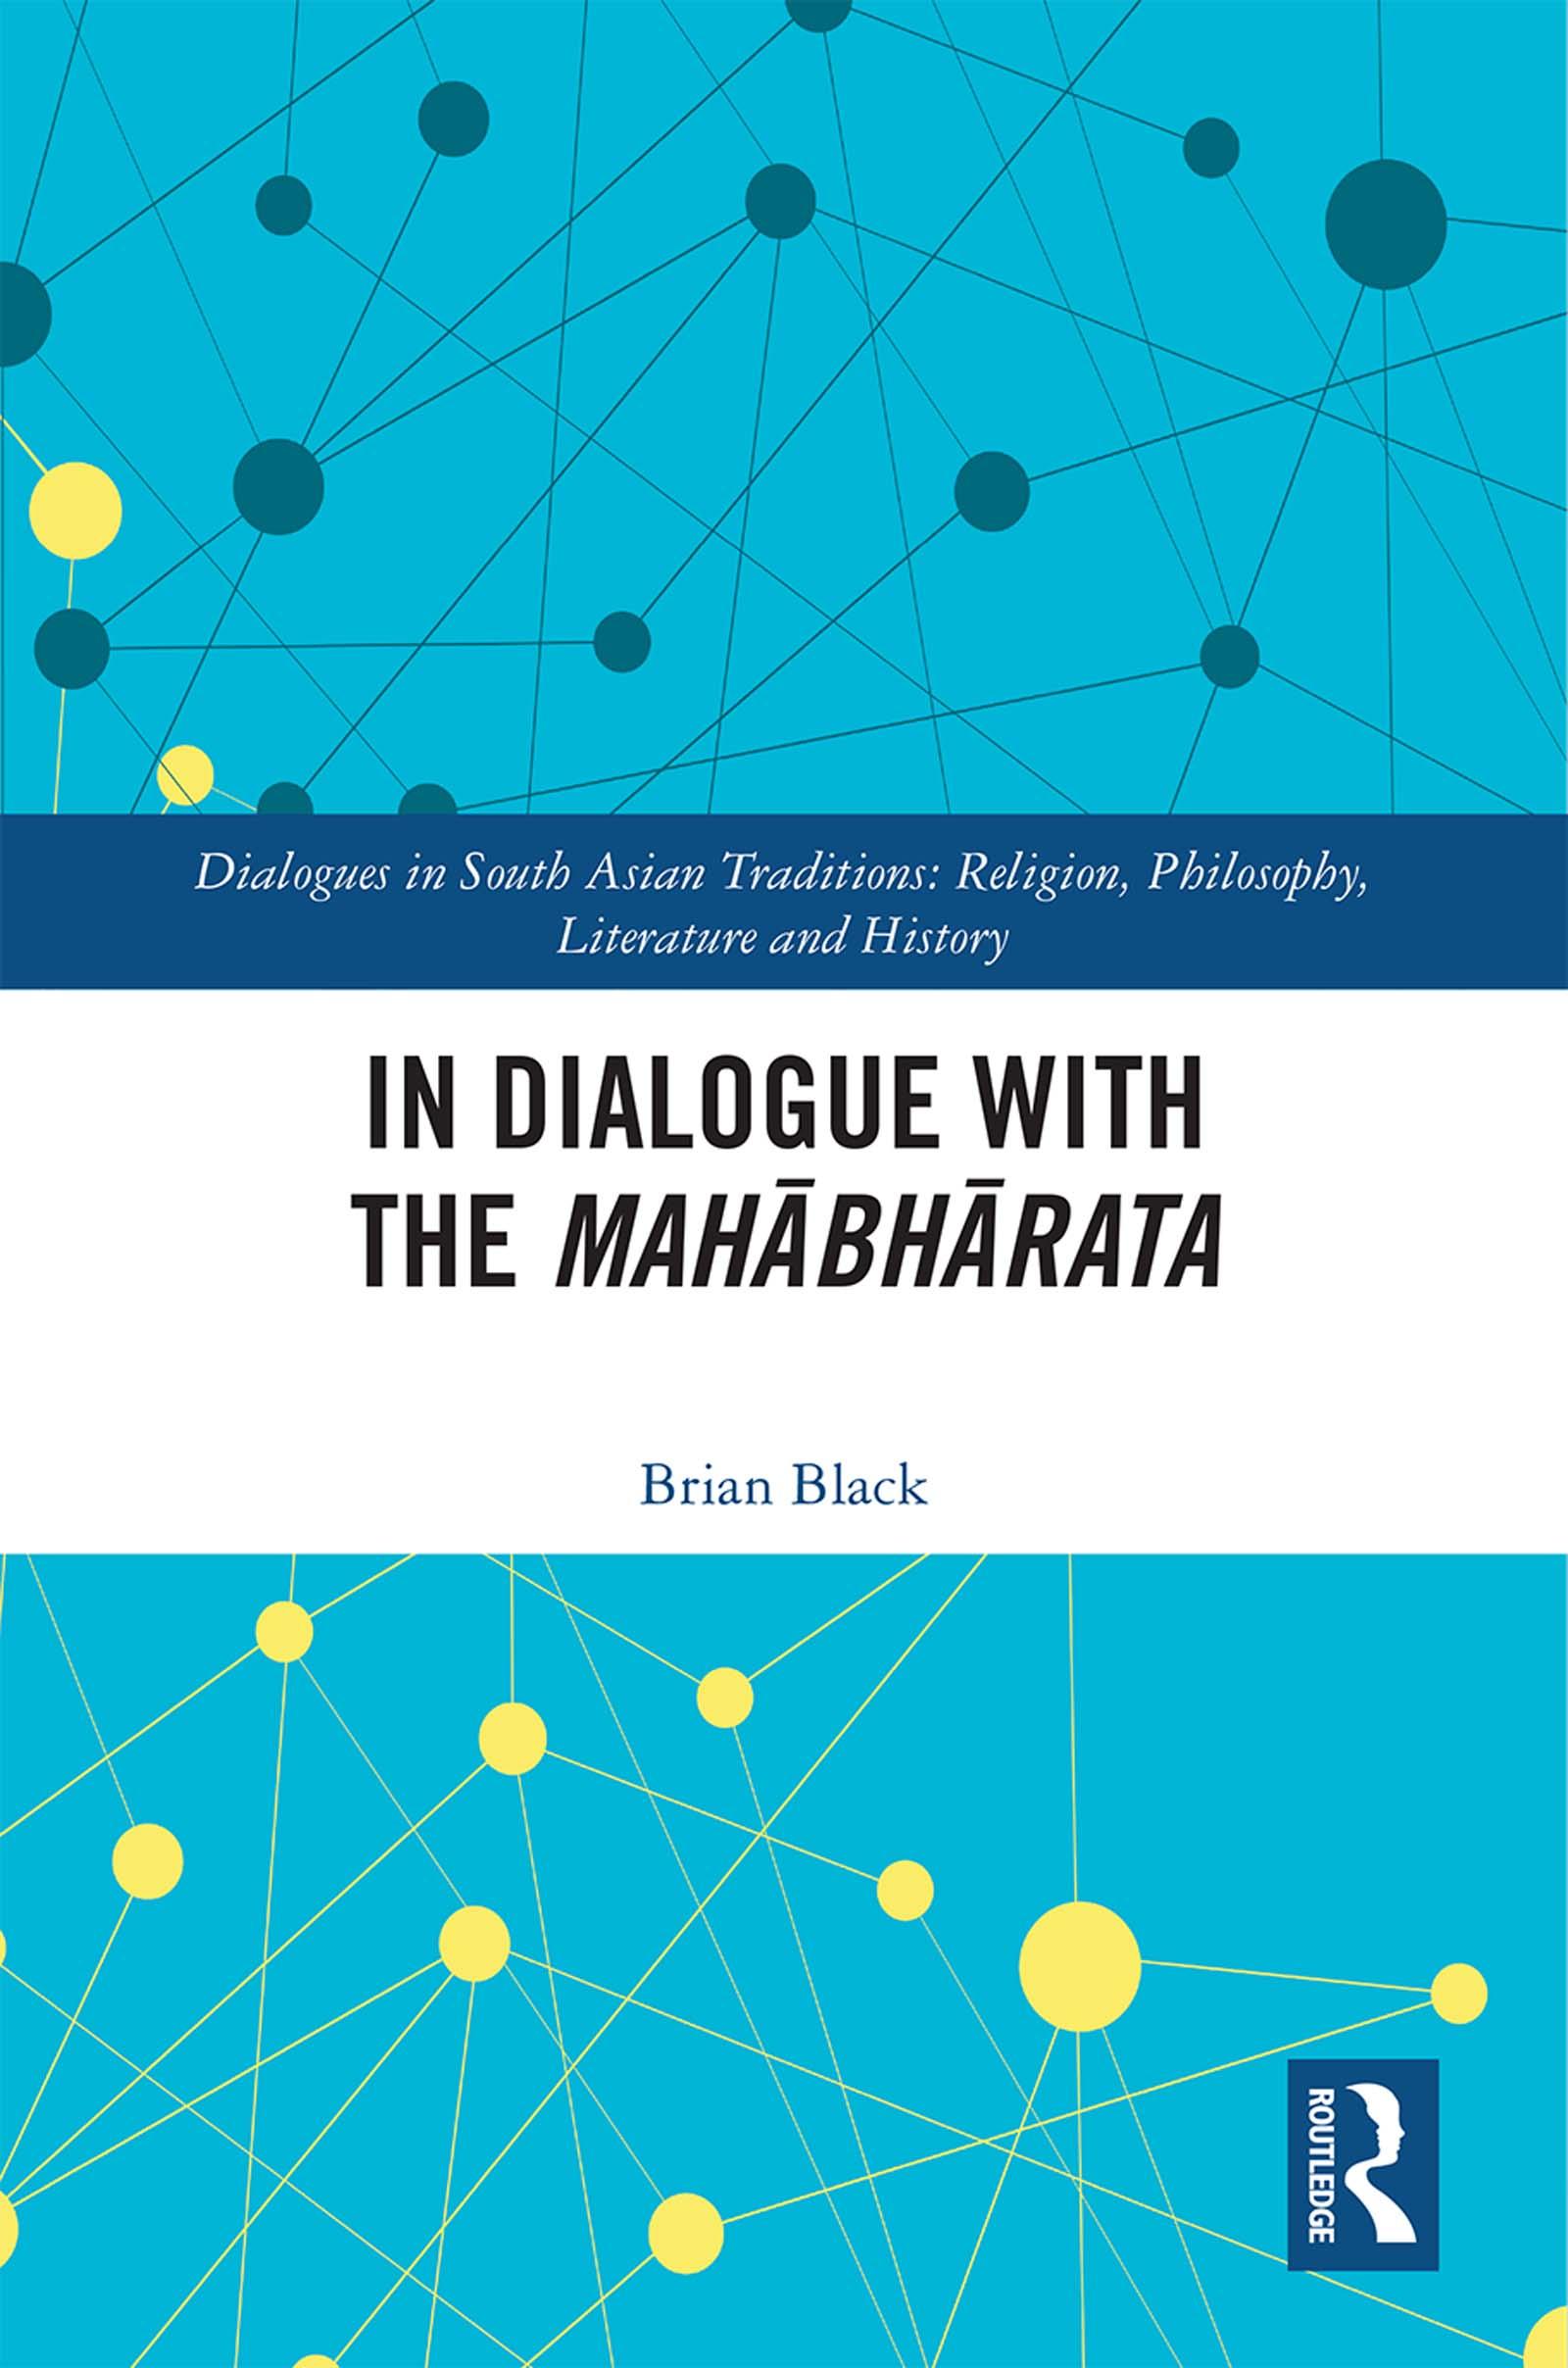 In Dialogue with the Mahābhārata